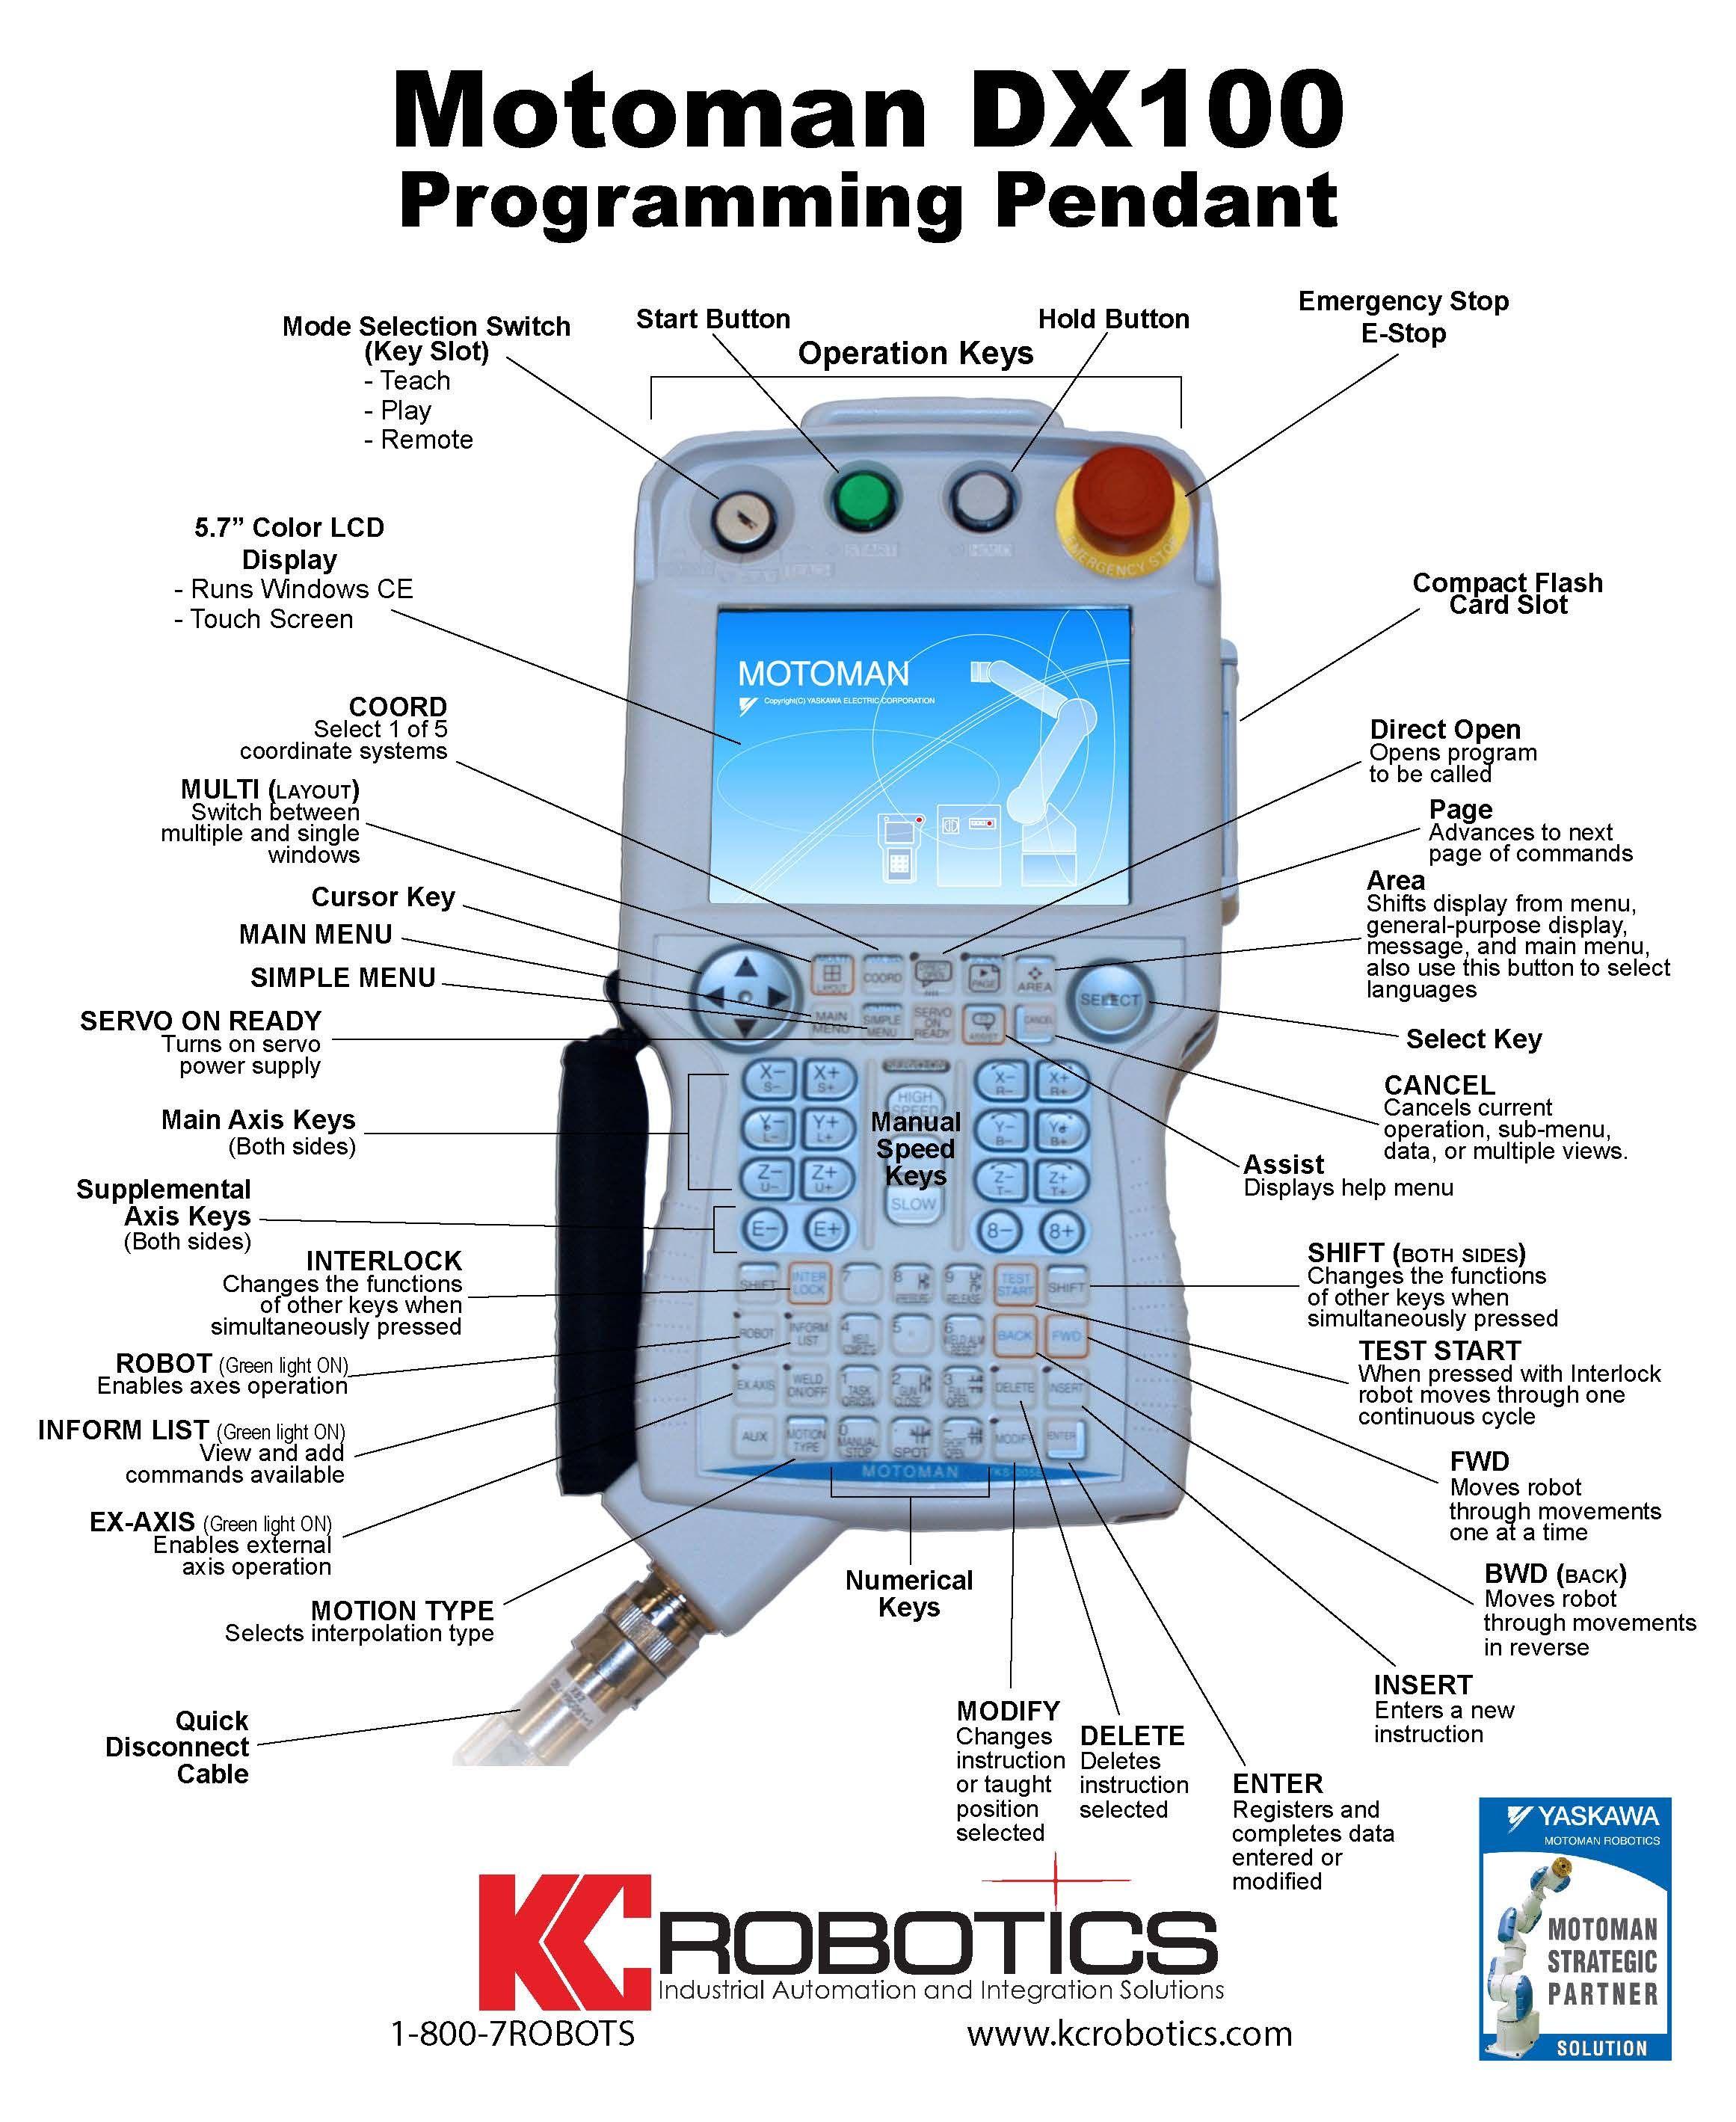 yaskawa dx100 manual product user guide instruction u2022 rh testdpc co motoman dx100 basic programming training manual motoman dx100 basic programming training manual pdf